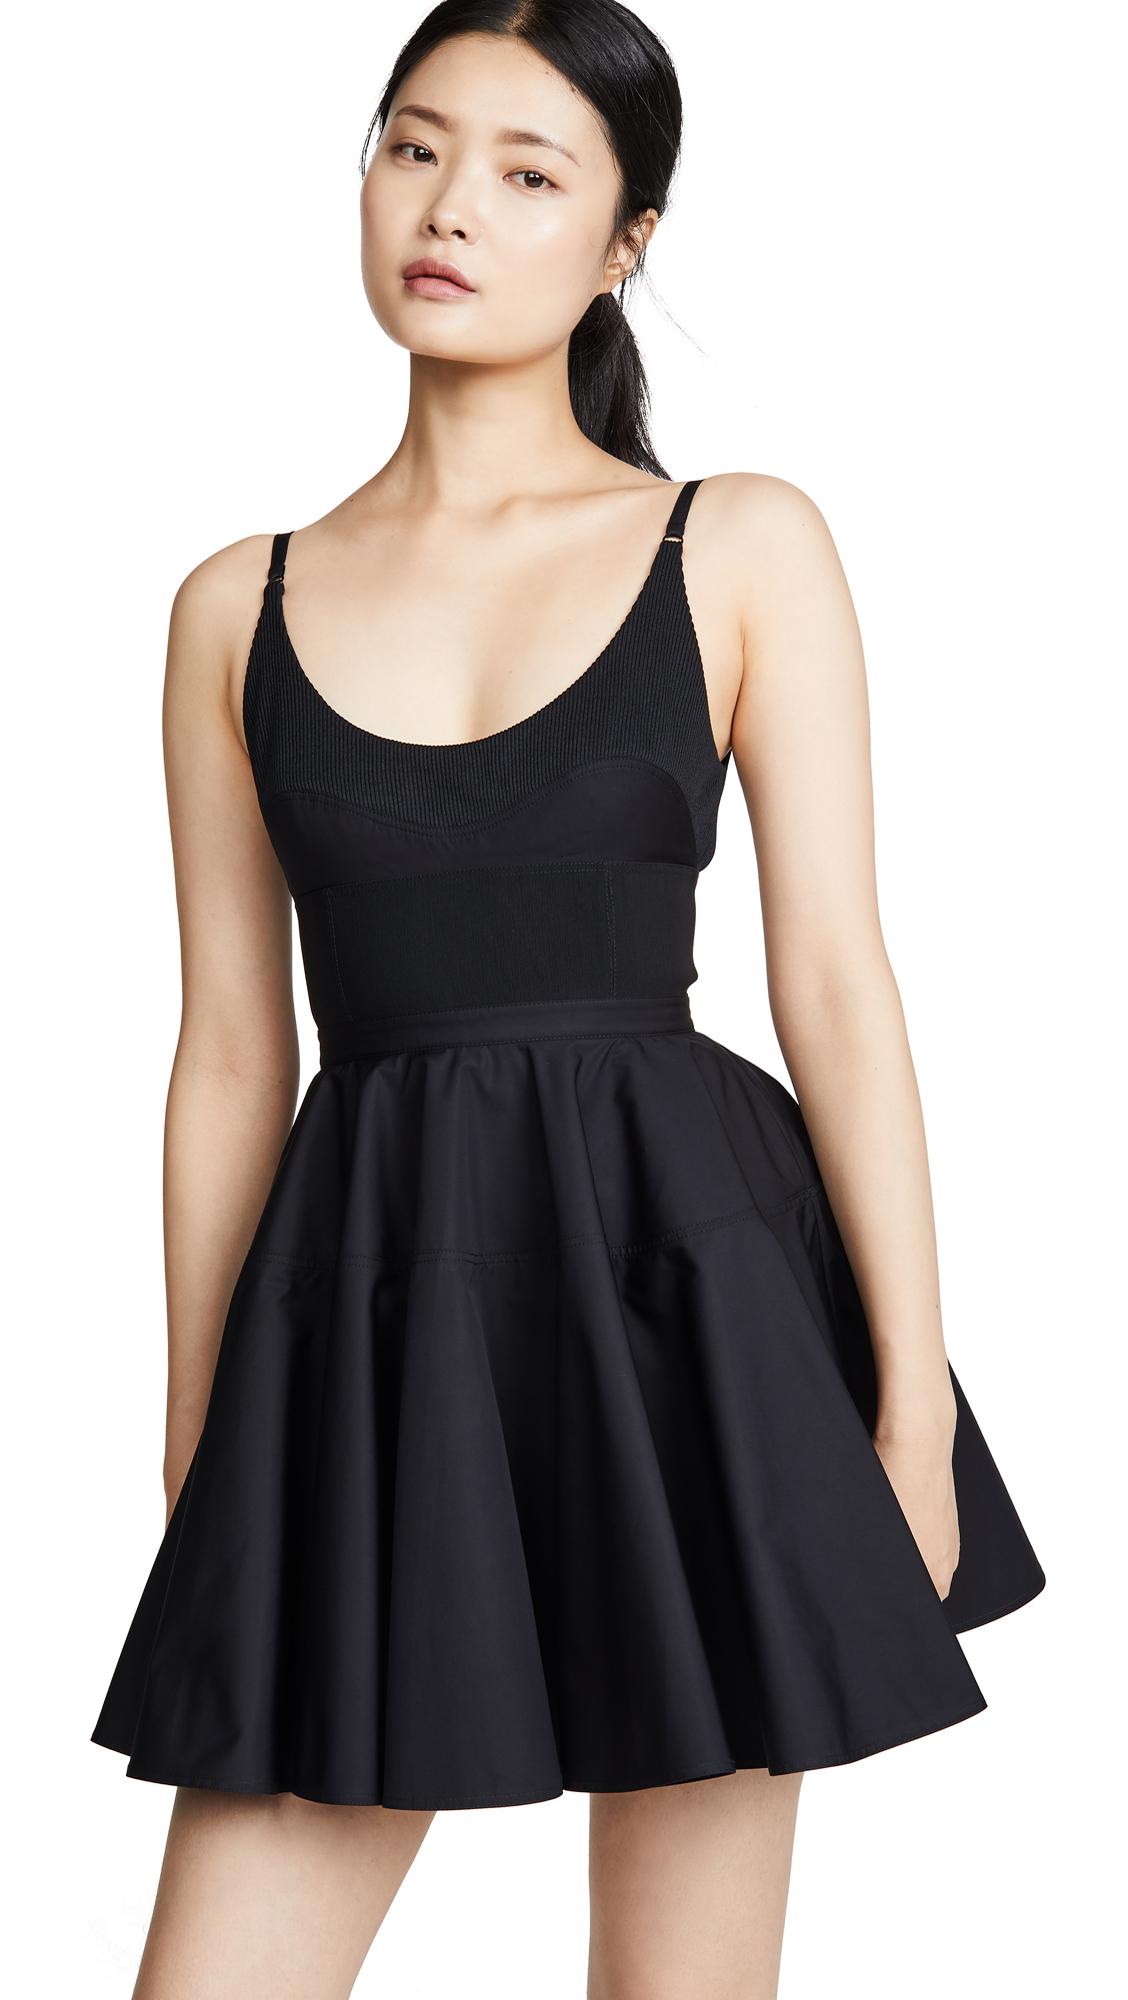 Alexander Wang Poplin Fit and Flare Dress - Black